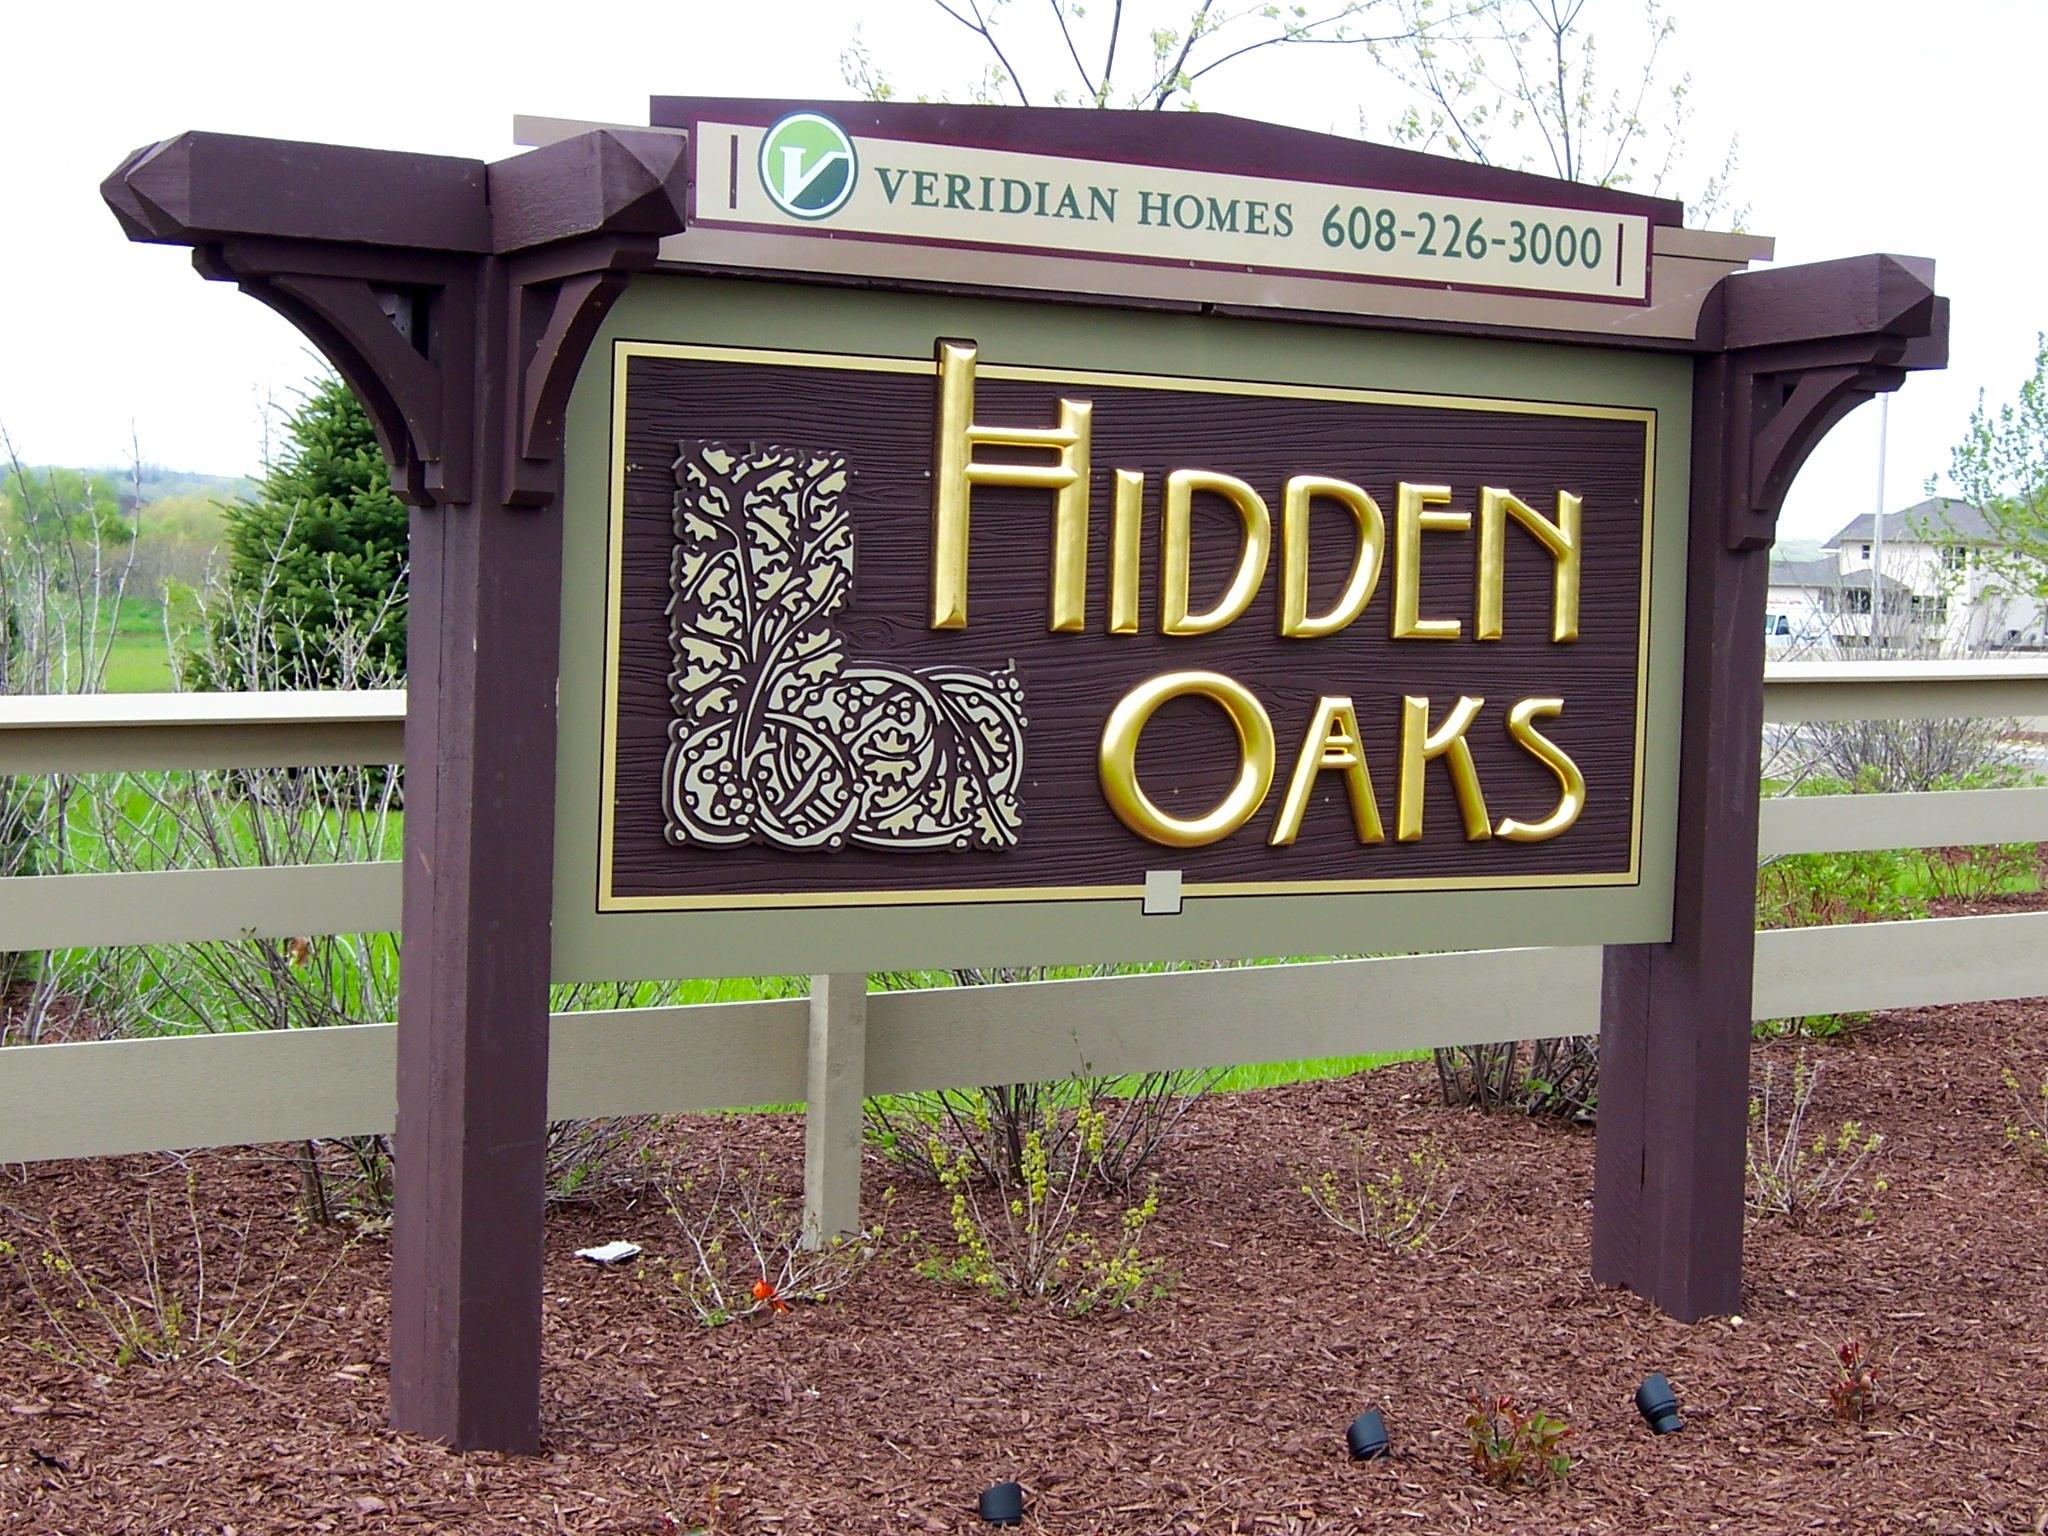 Neighborhood_hidden_oaks.JPG